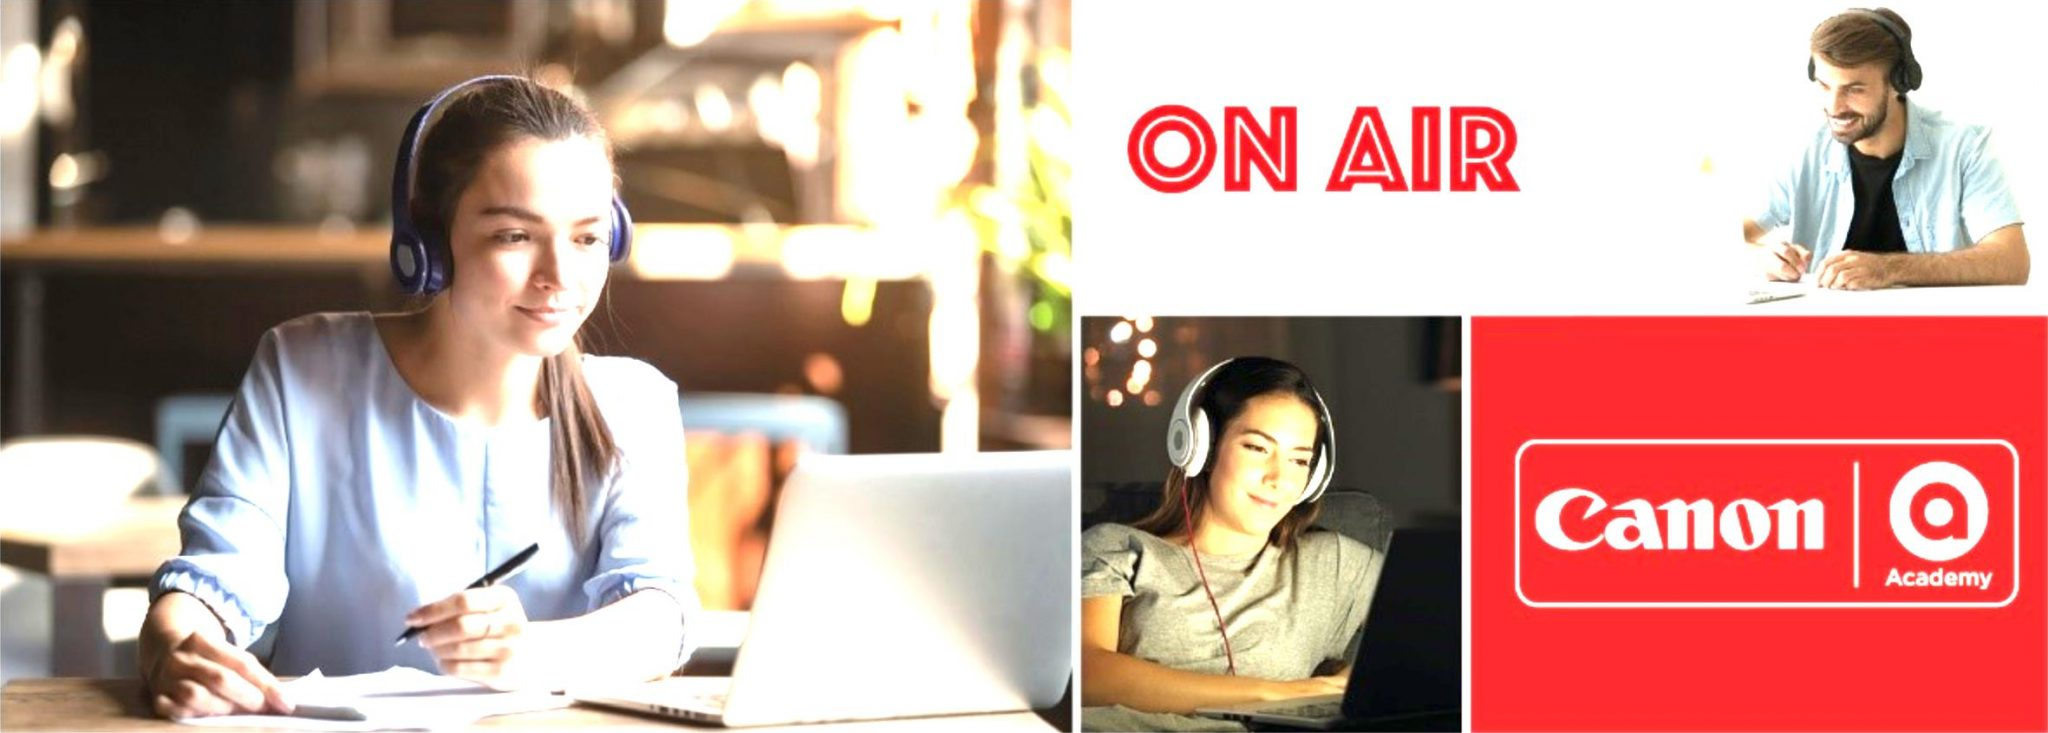 Canon Academy On Air: siamo tutti dei professionisti thumbnail